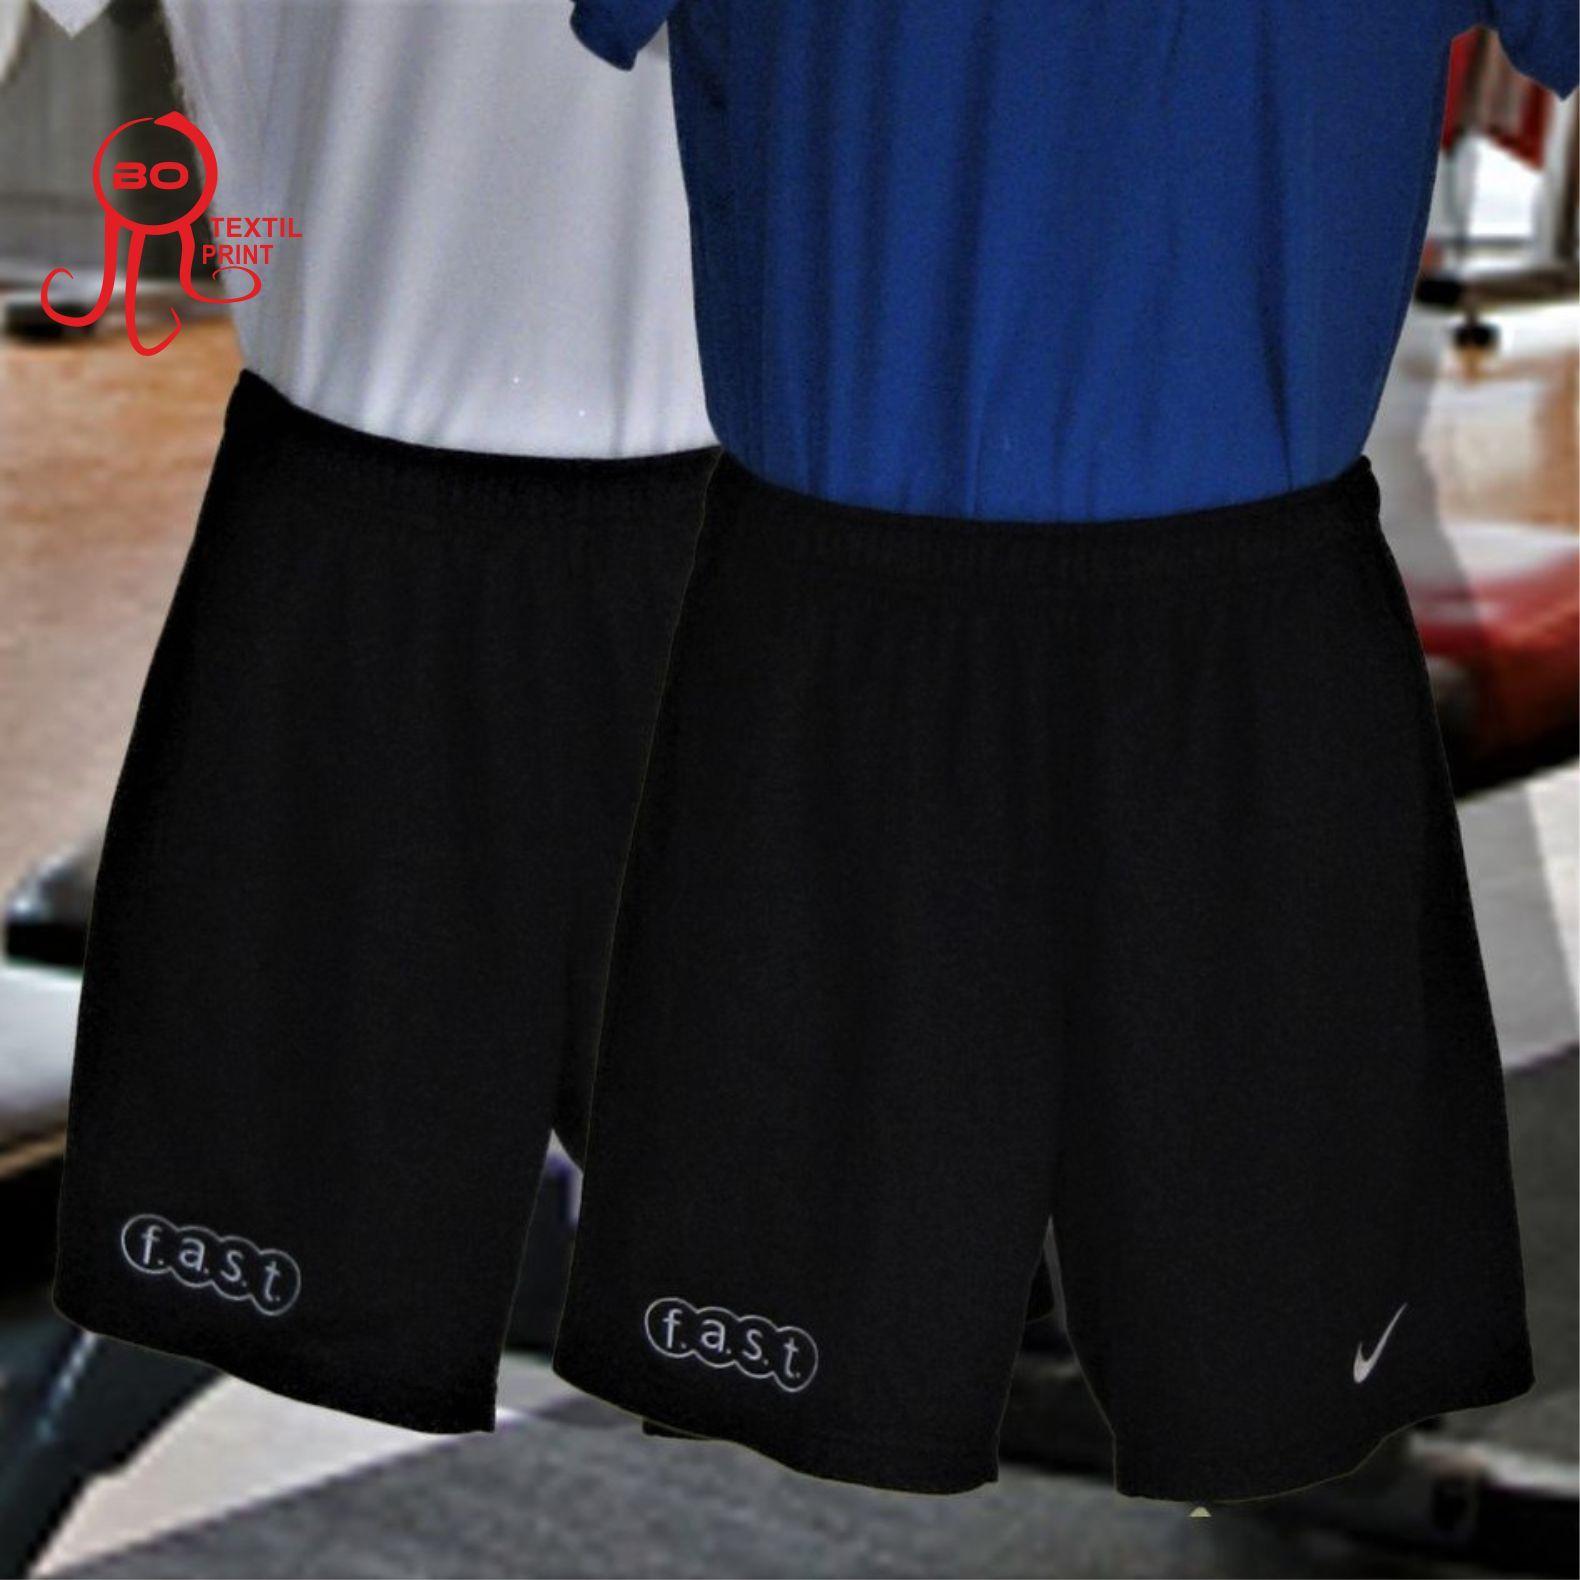 Pantalones cortos de deporte con bordados. www.botextilprint.es   botextilprint  serigrafia 93783f0fa7b4a